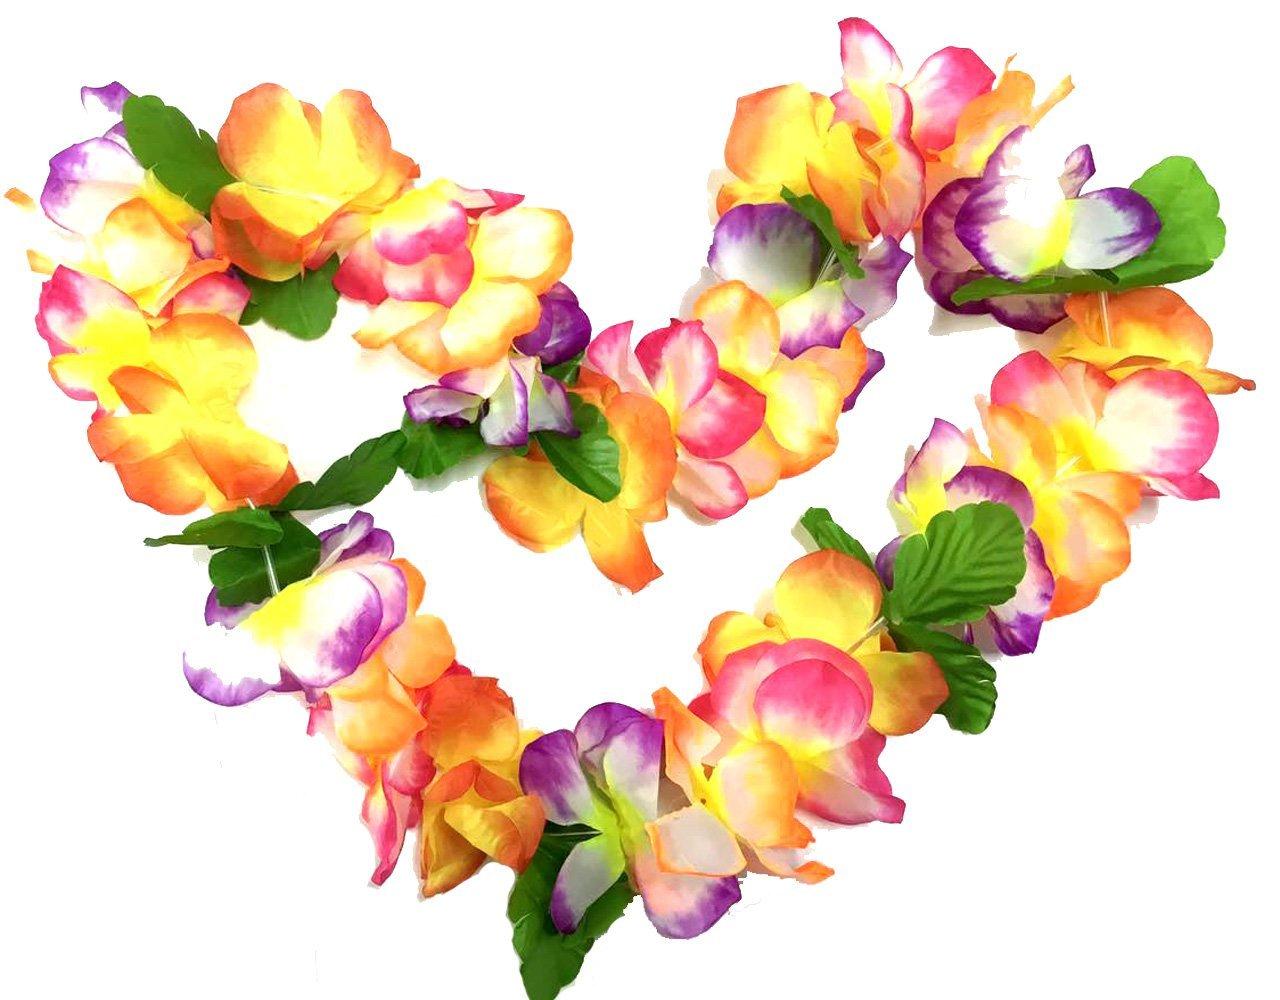 Amazon bosheng hawaiian colorful flower leis necklaces for amazon bosheng hawaiian colorful flower leis necklaces for summer party eventset of 6 toys games izmirmasajfo